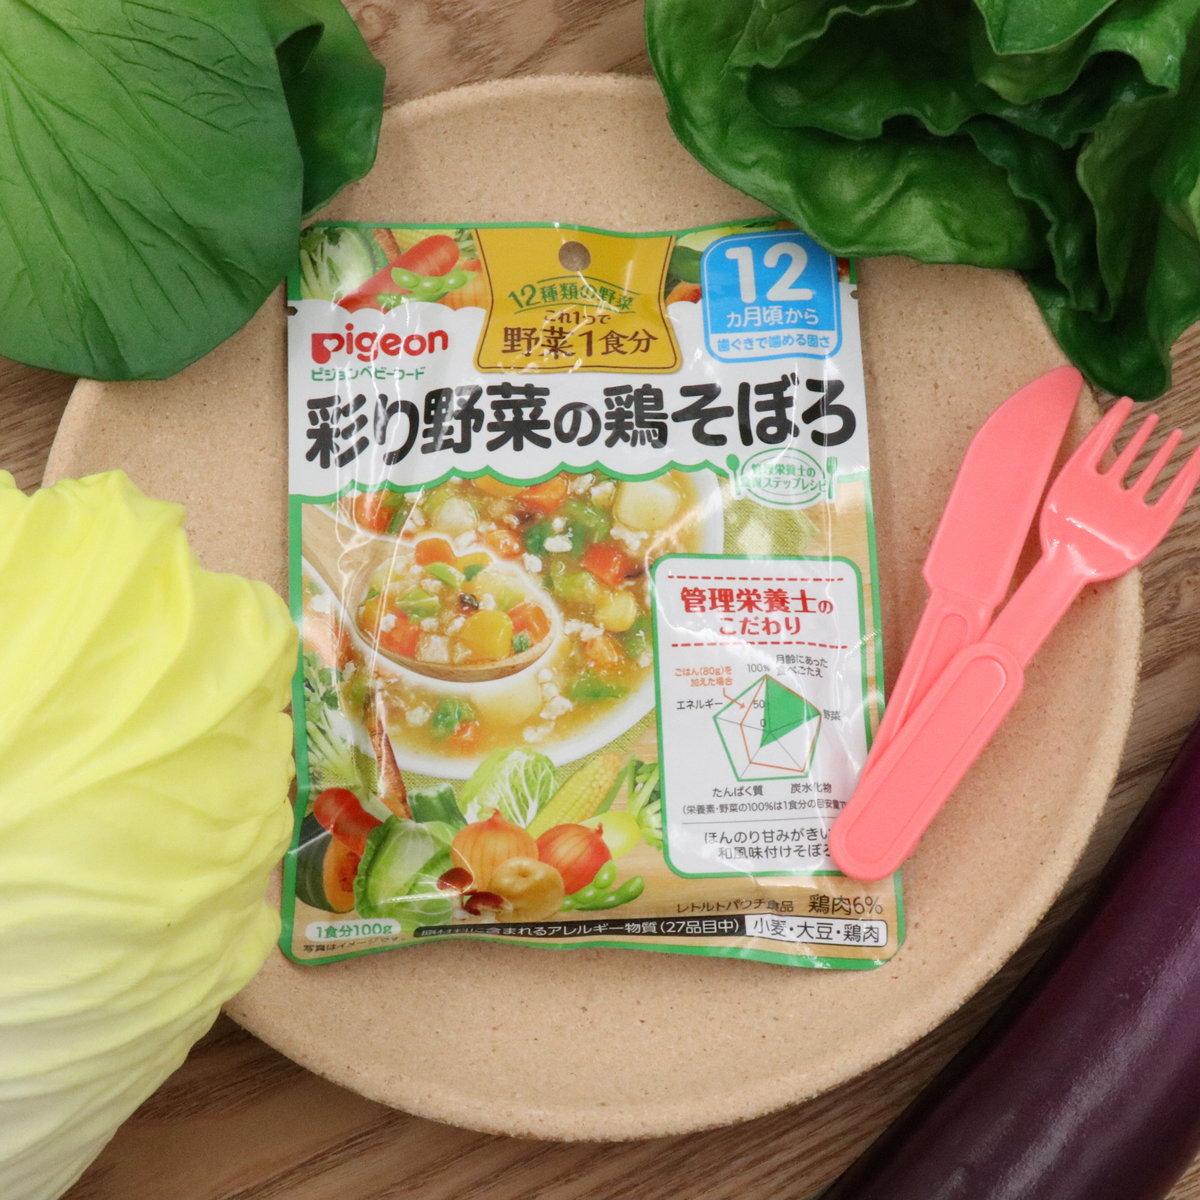 (PE-094SP2) Pigeon - 彩色野蔬煮雞肉100g (2包裝) (12個月或以上嬰兒)